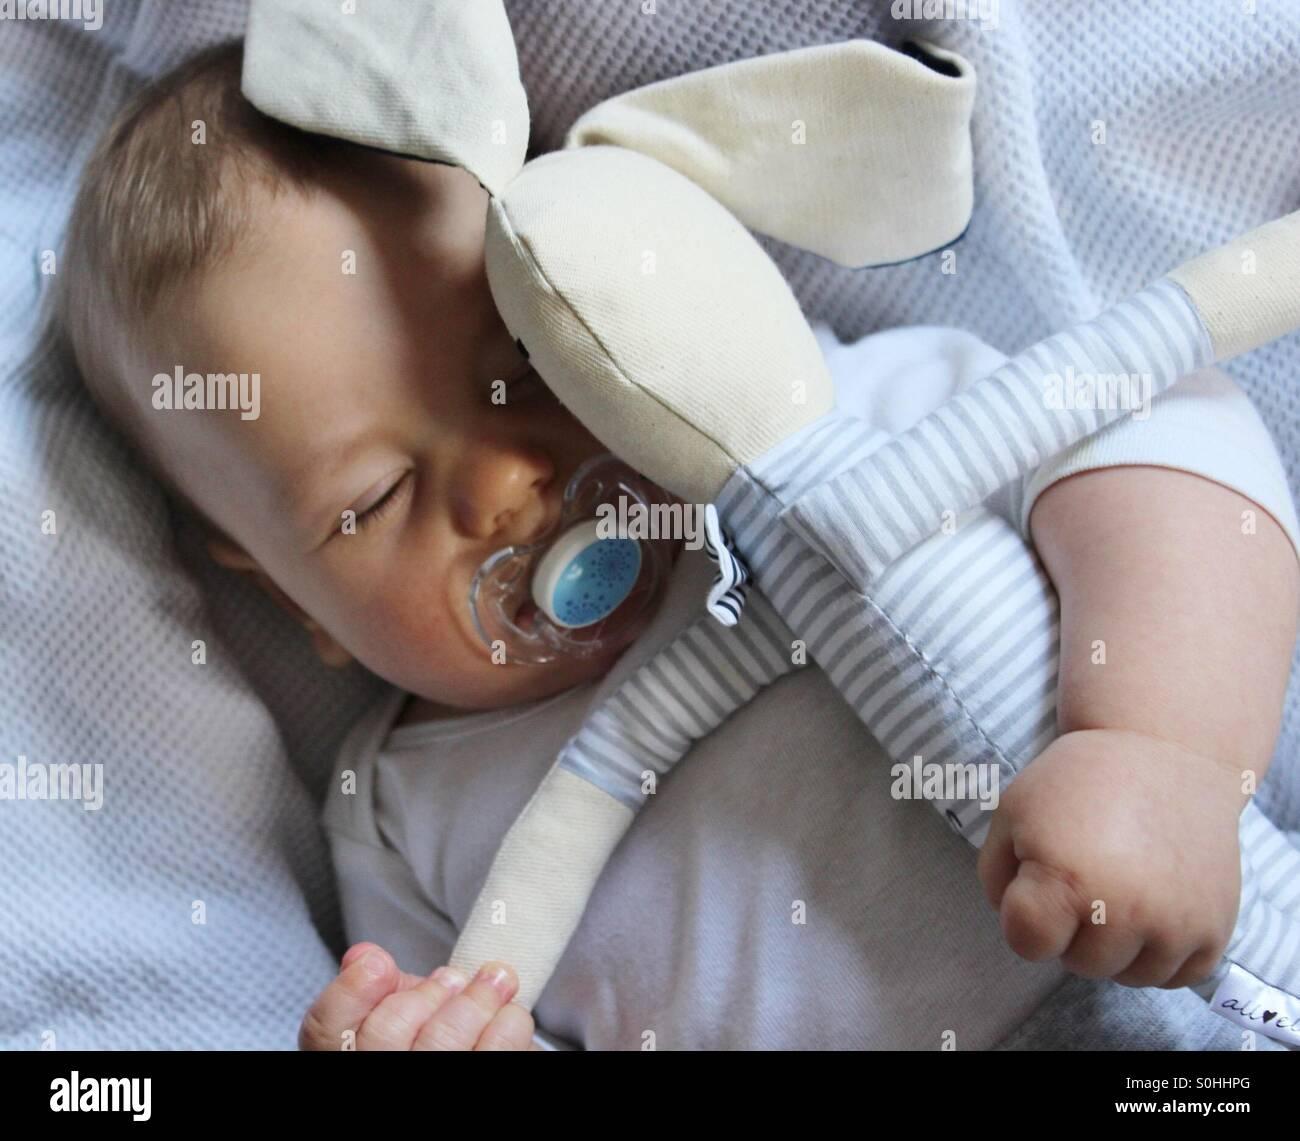 Bébé garçon endormi avec son bunny toy Photo Stock